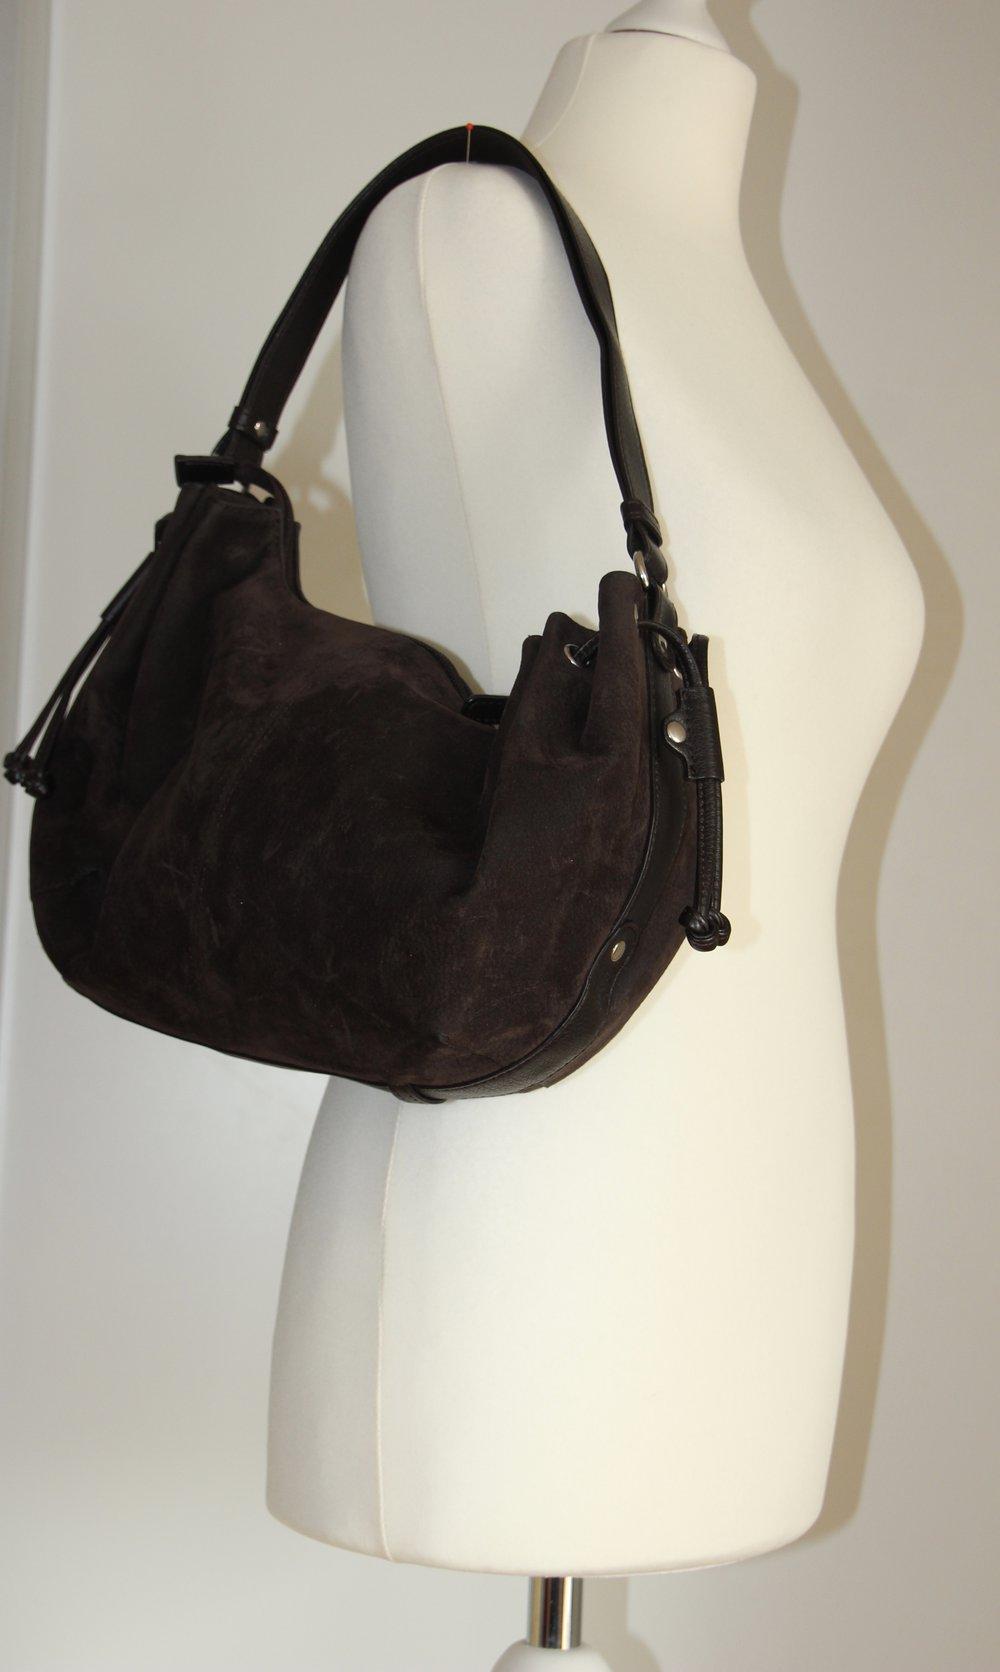 handtasche von esprit in braun wildlederoptik hobobag. Black Bedroom Furniture Sets. Home Design Ideas